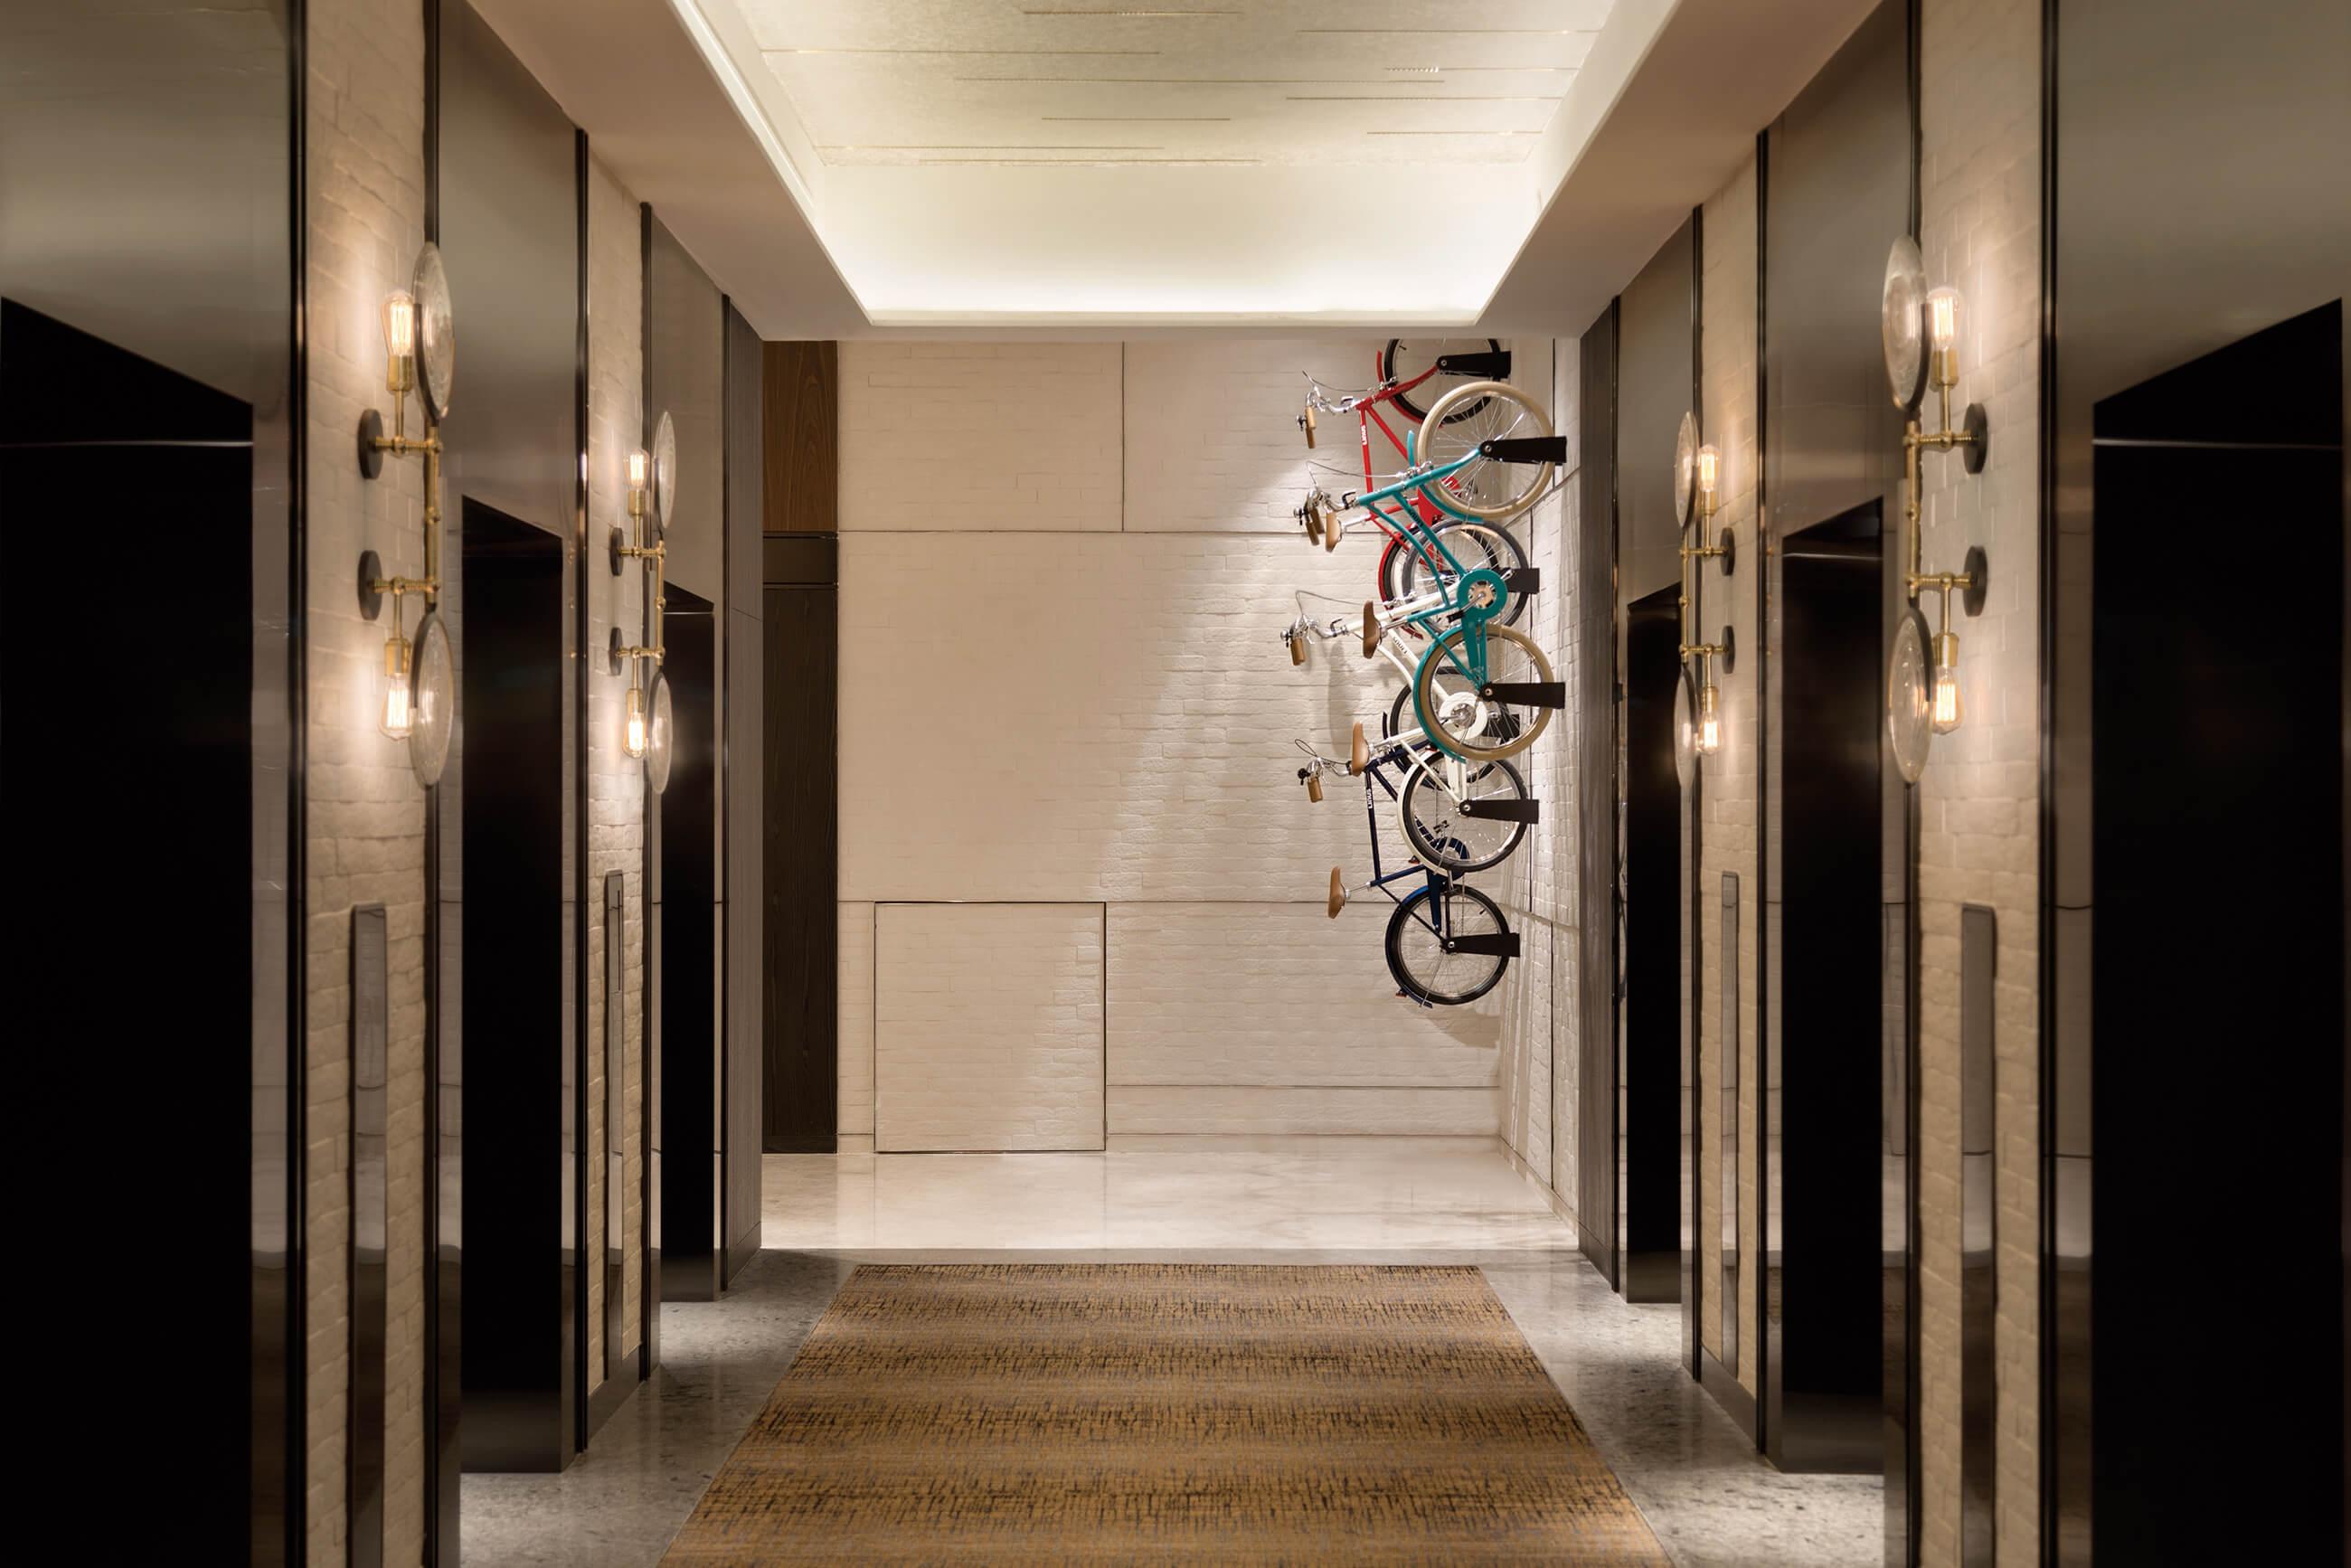 https://bubo.sk/uploads/galleries/7466/jen_tanglin_hotel_izby.jpg